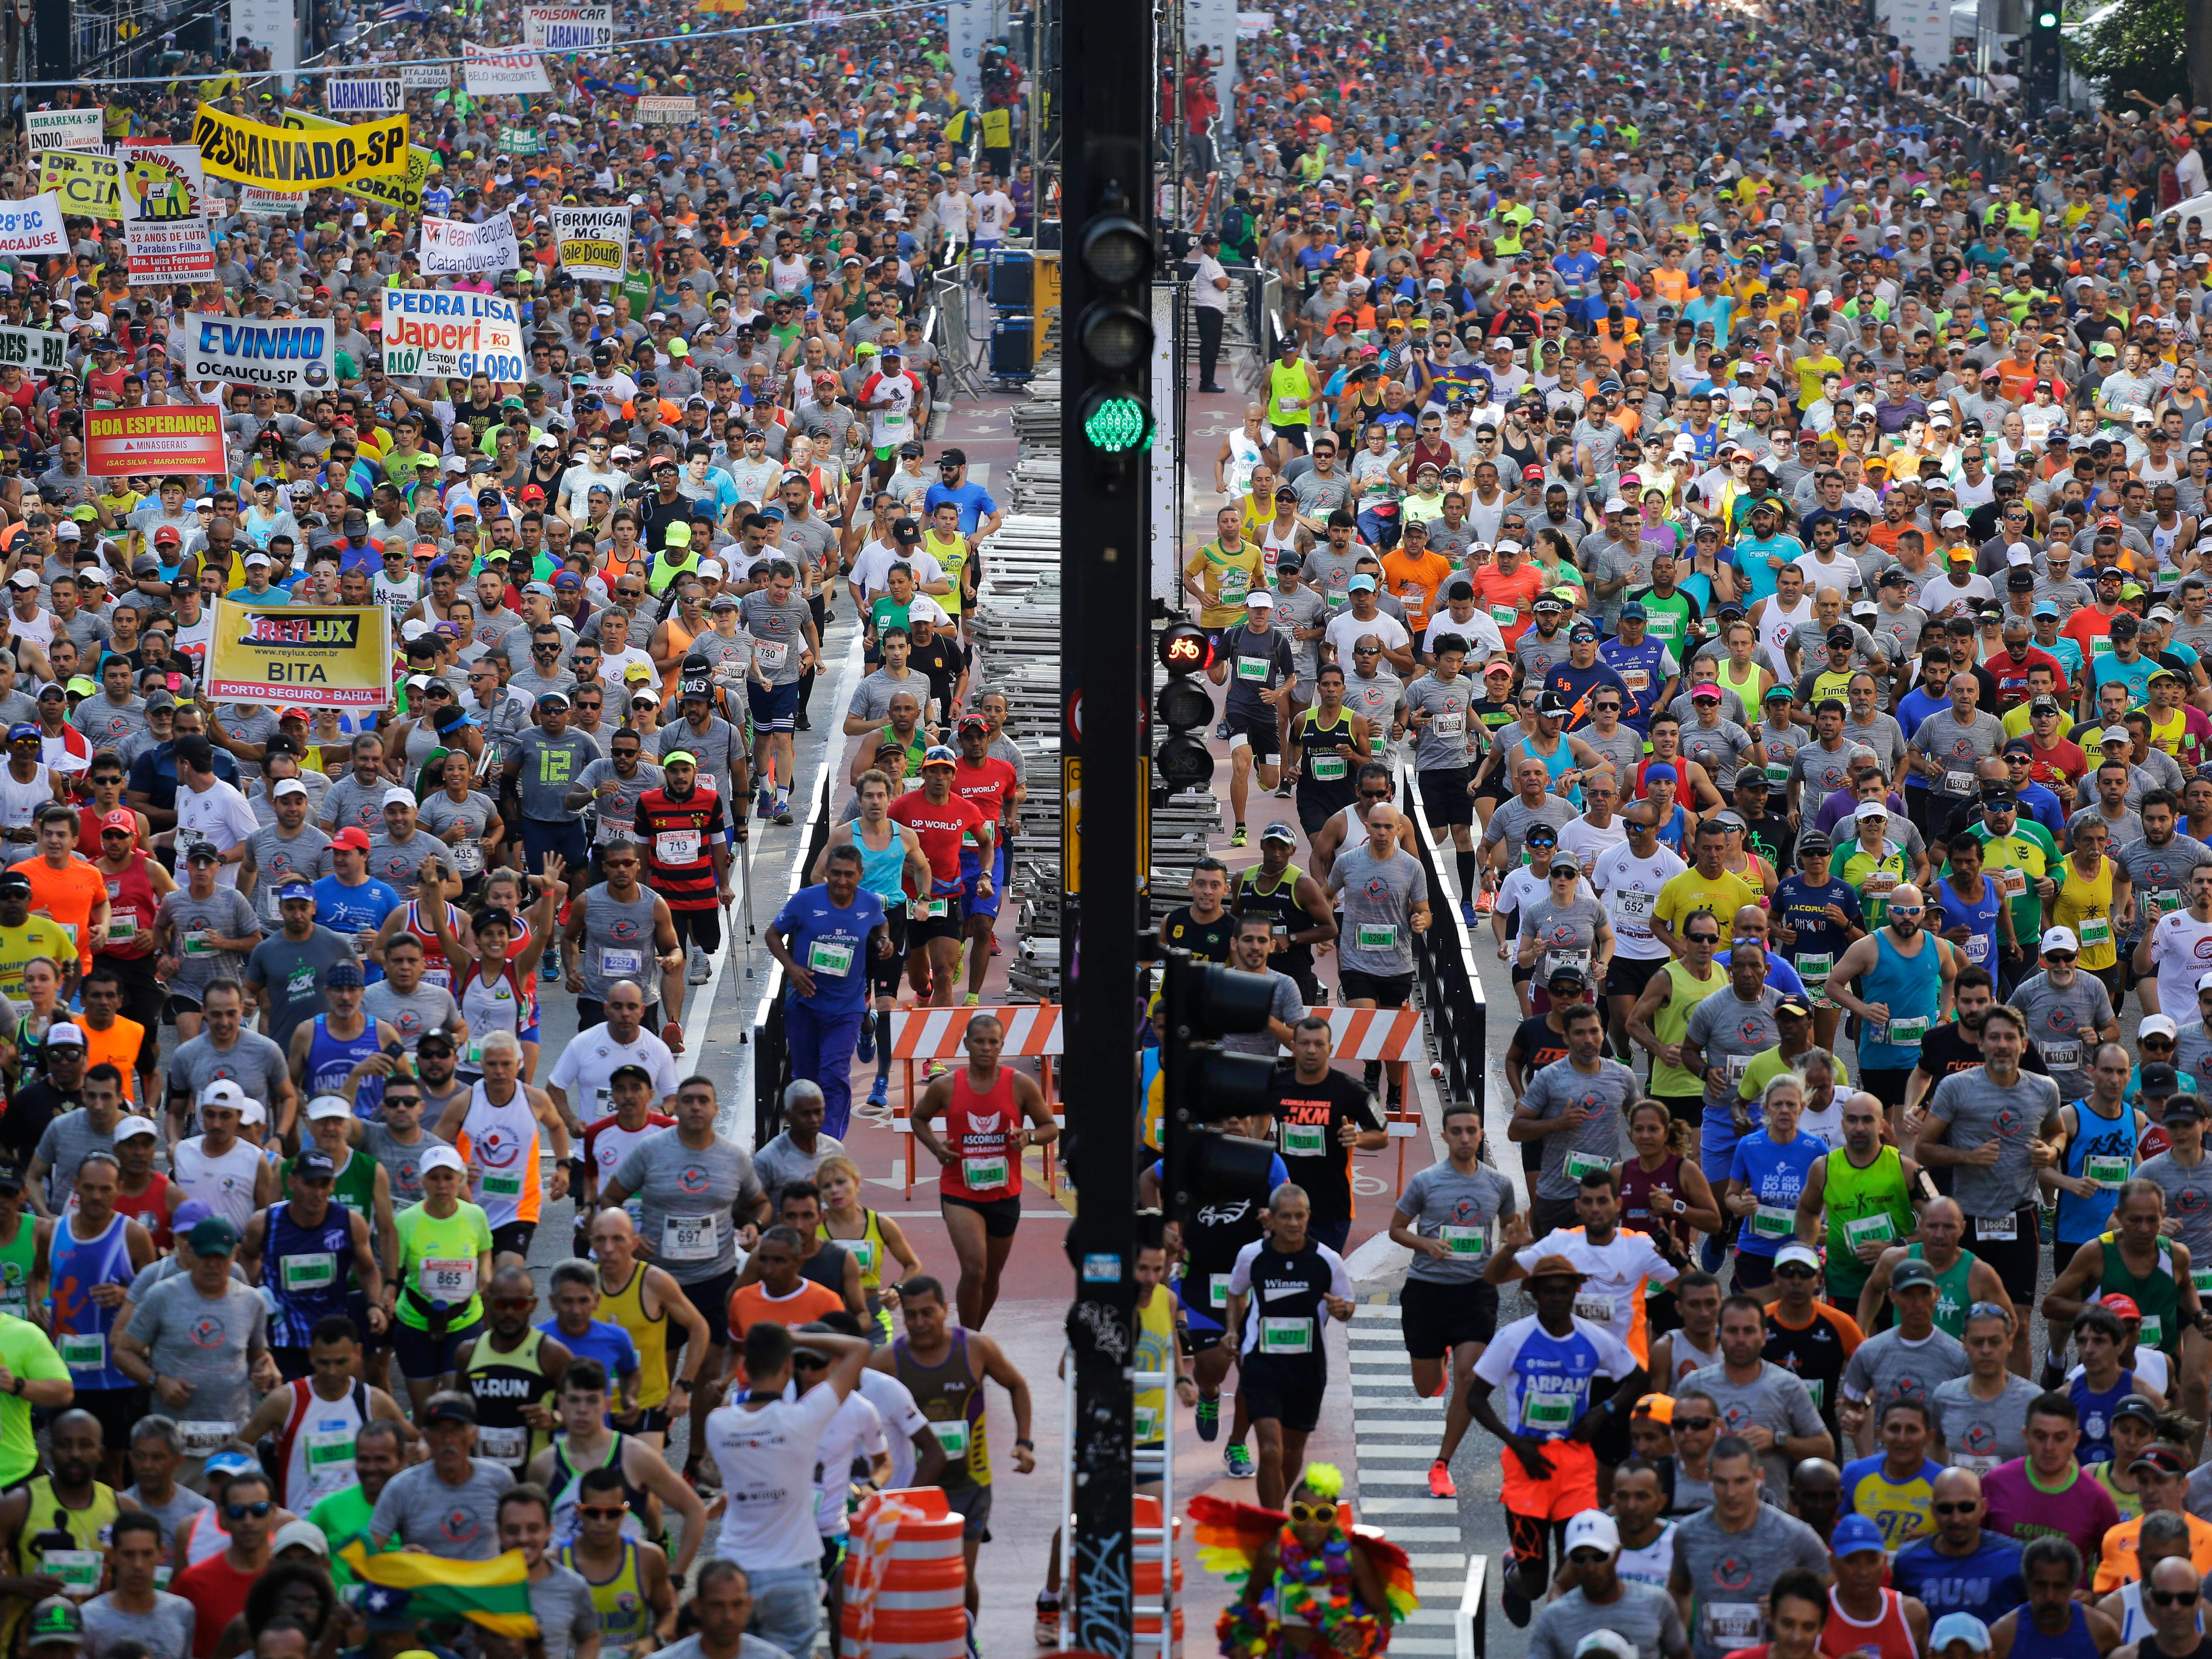 Runners start the Sao Silvestre race in Sao Paulo, Brazil.